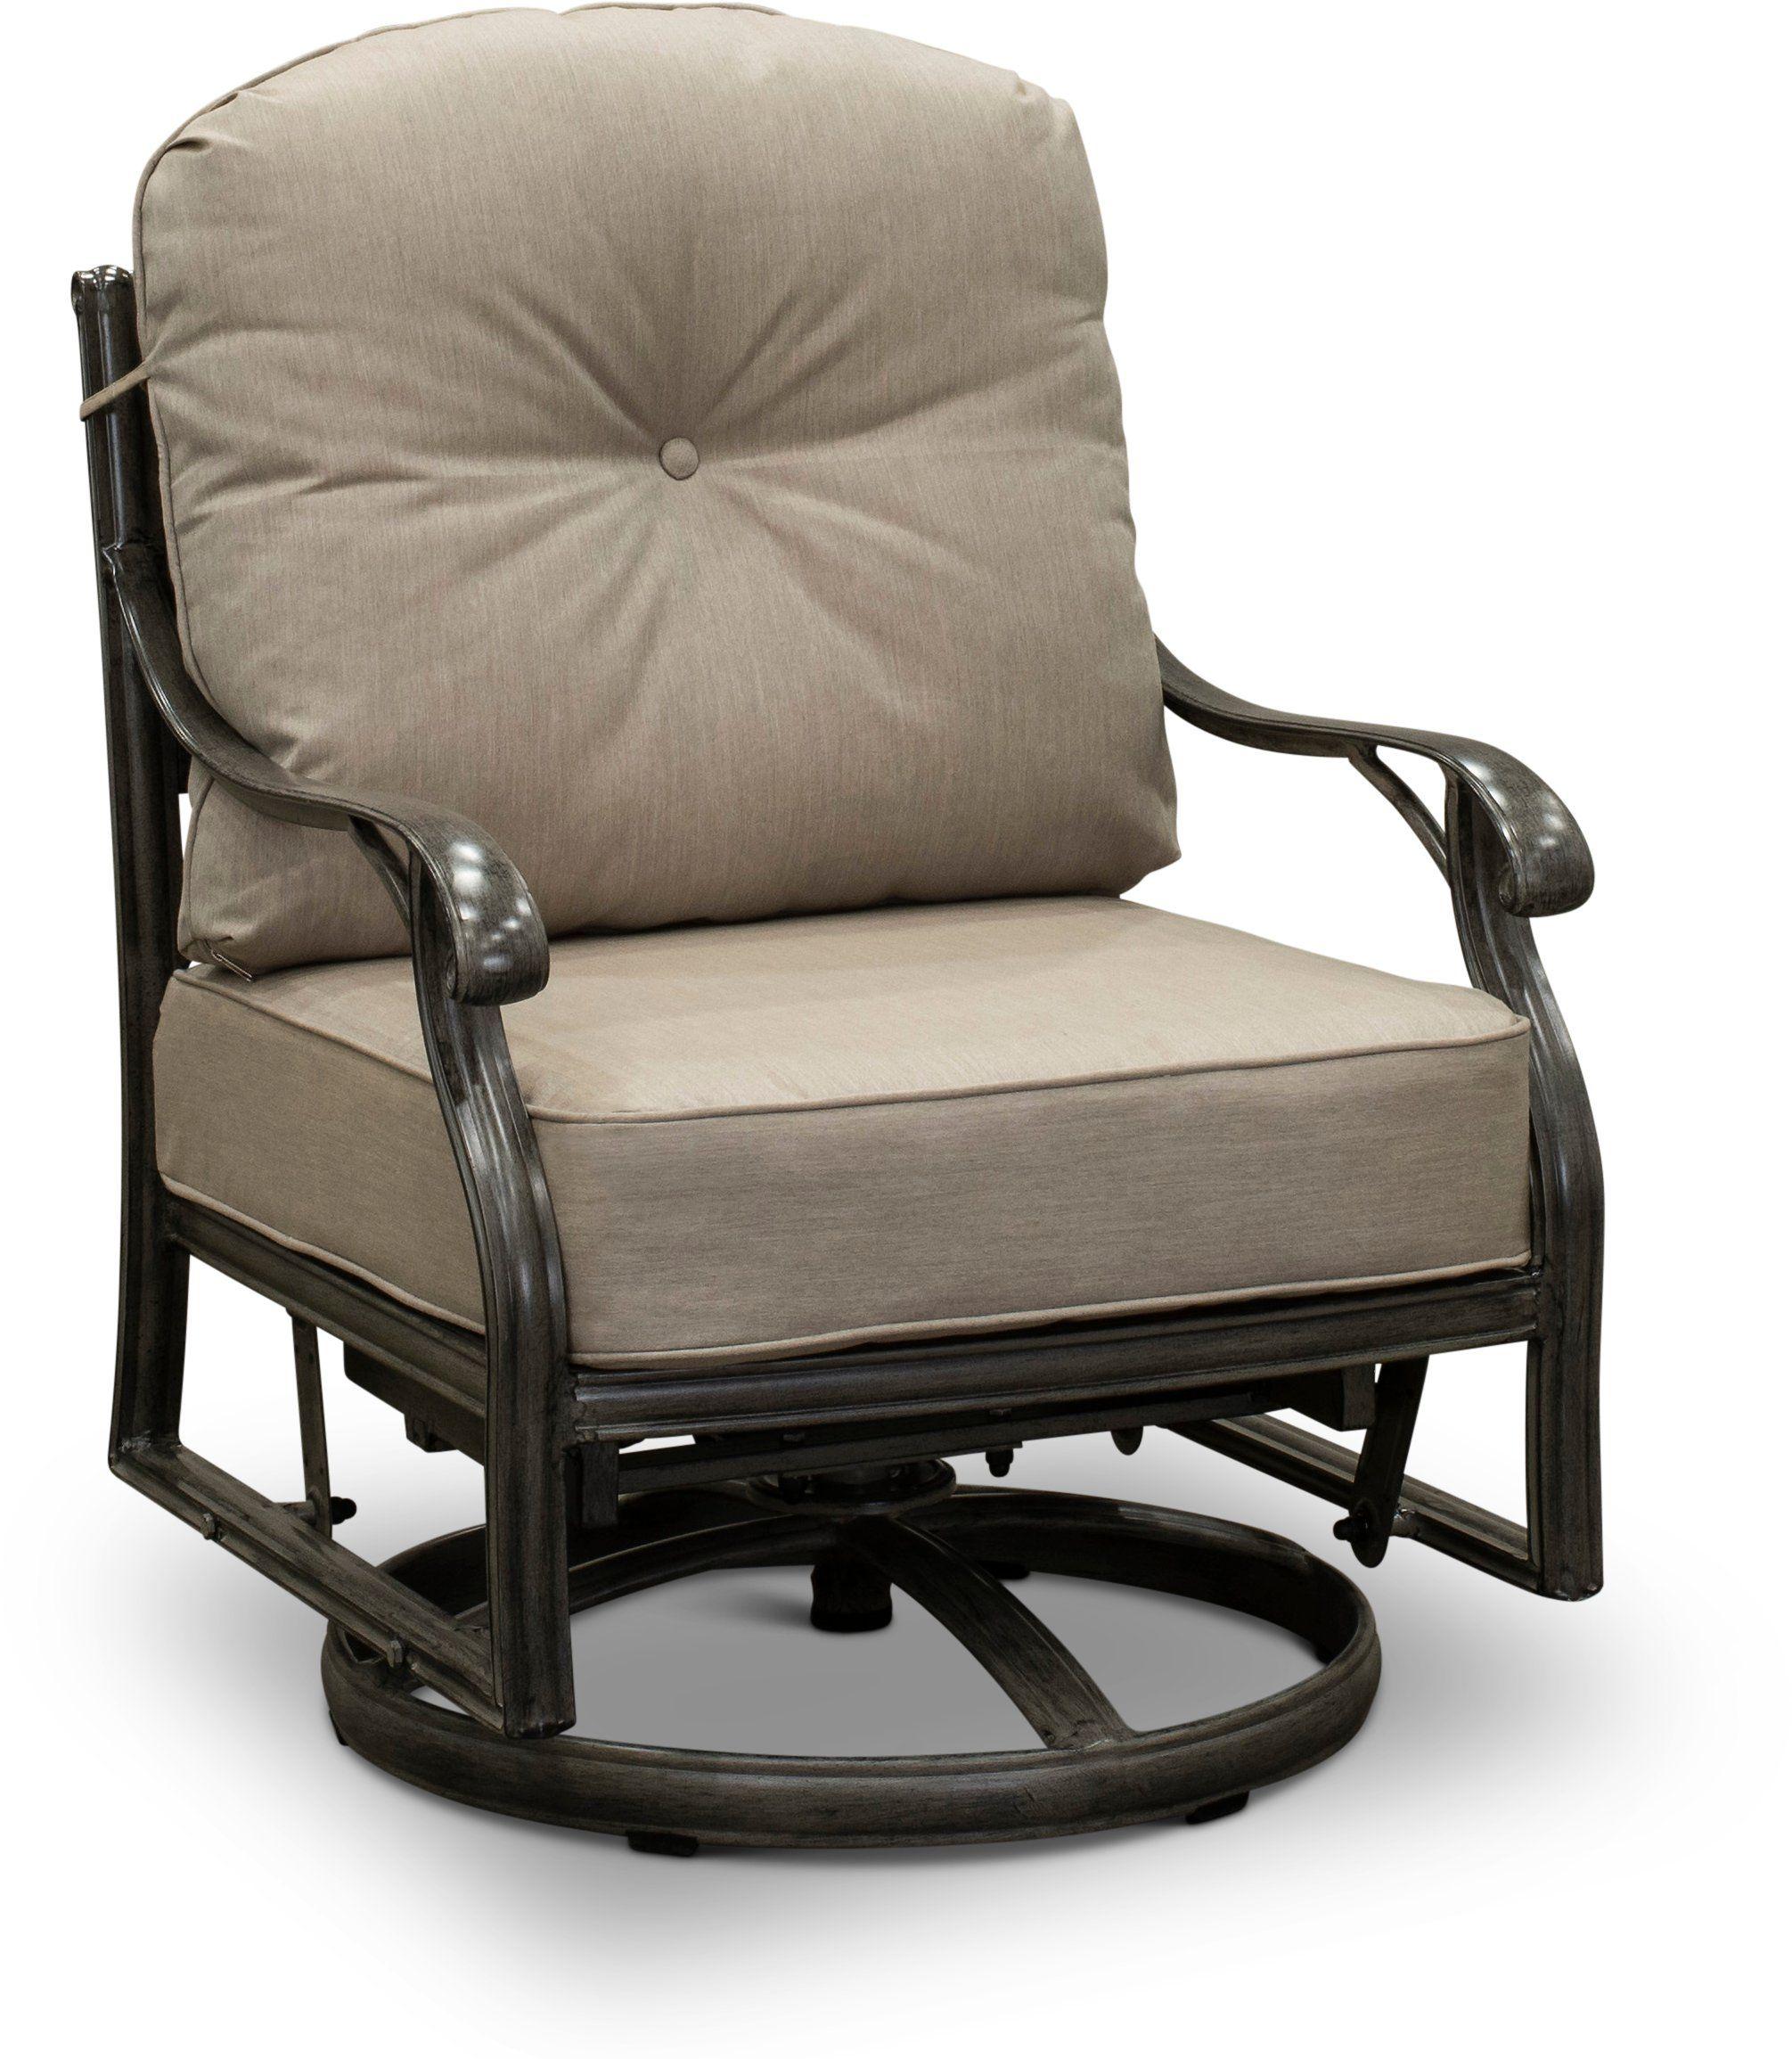 High Back Patio Dining Swivel Rocker Macan In 2021 Patio Chairs Swivel Rocker Chair Swivel Rocking Chair